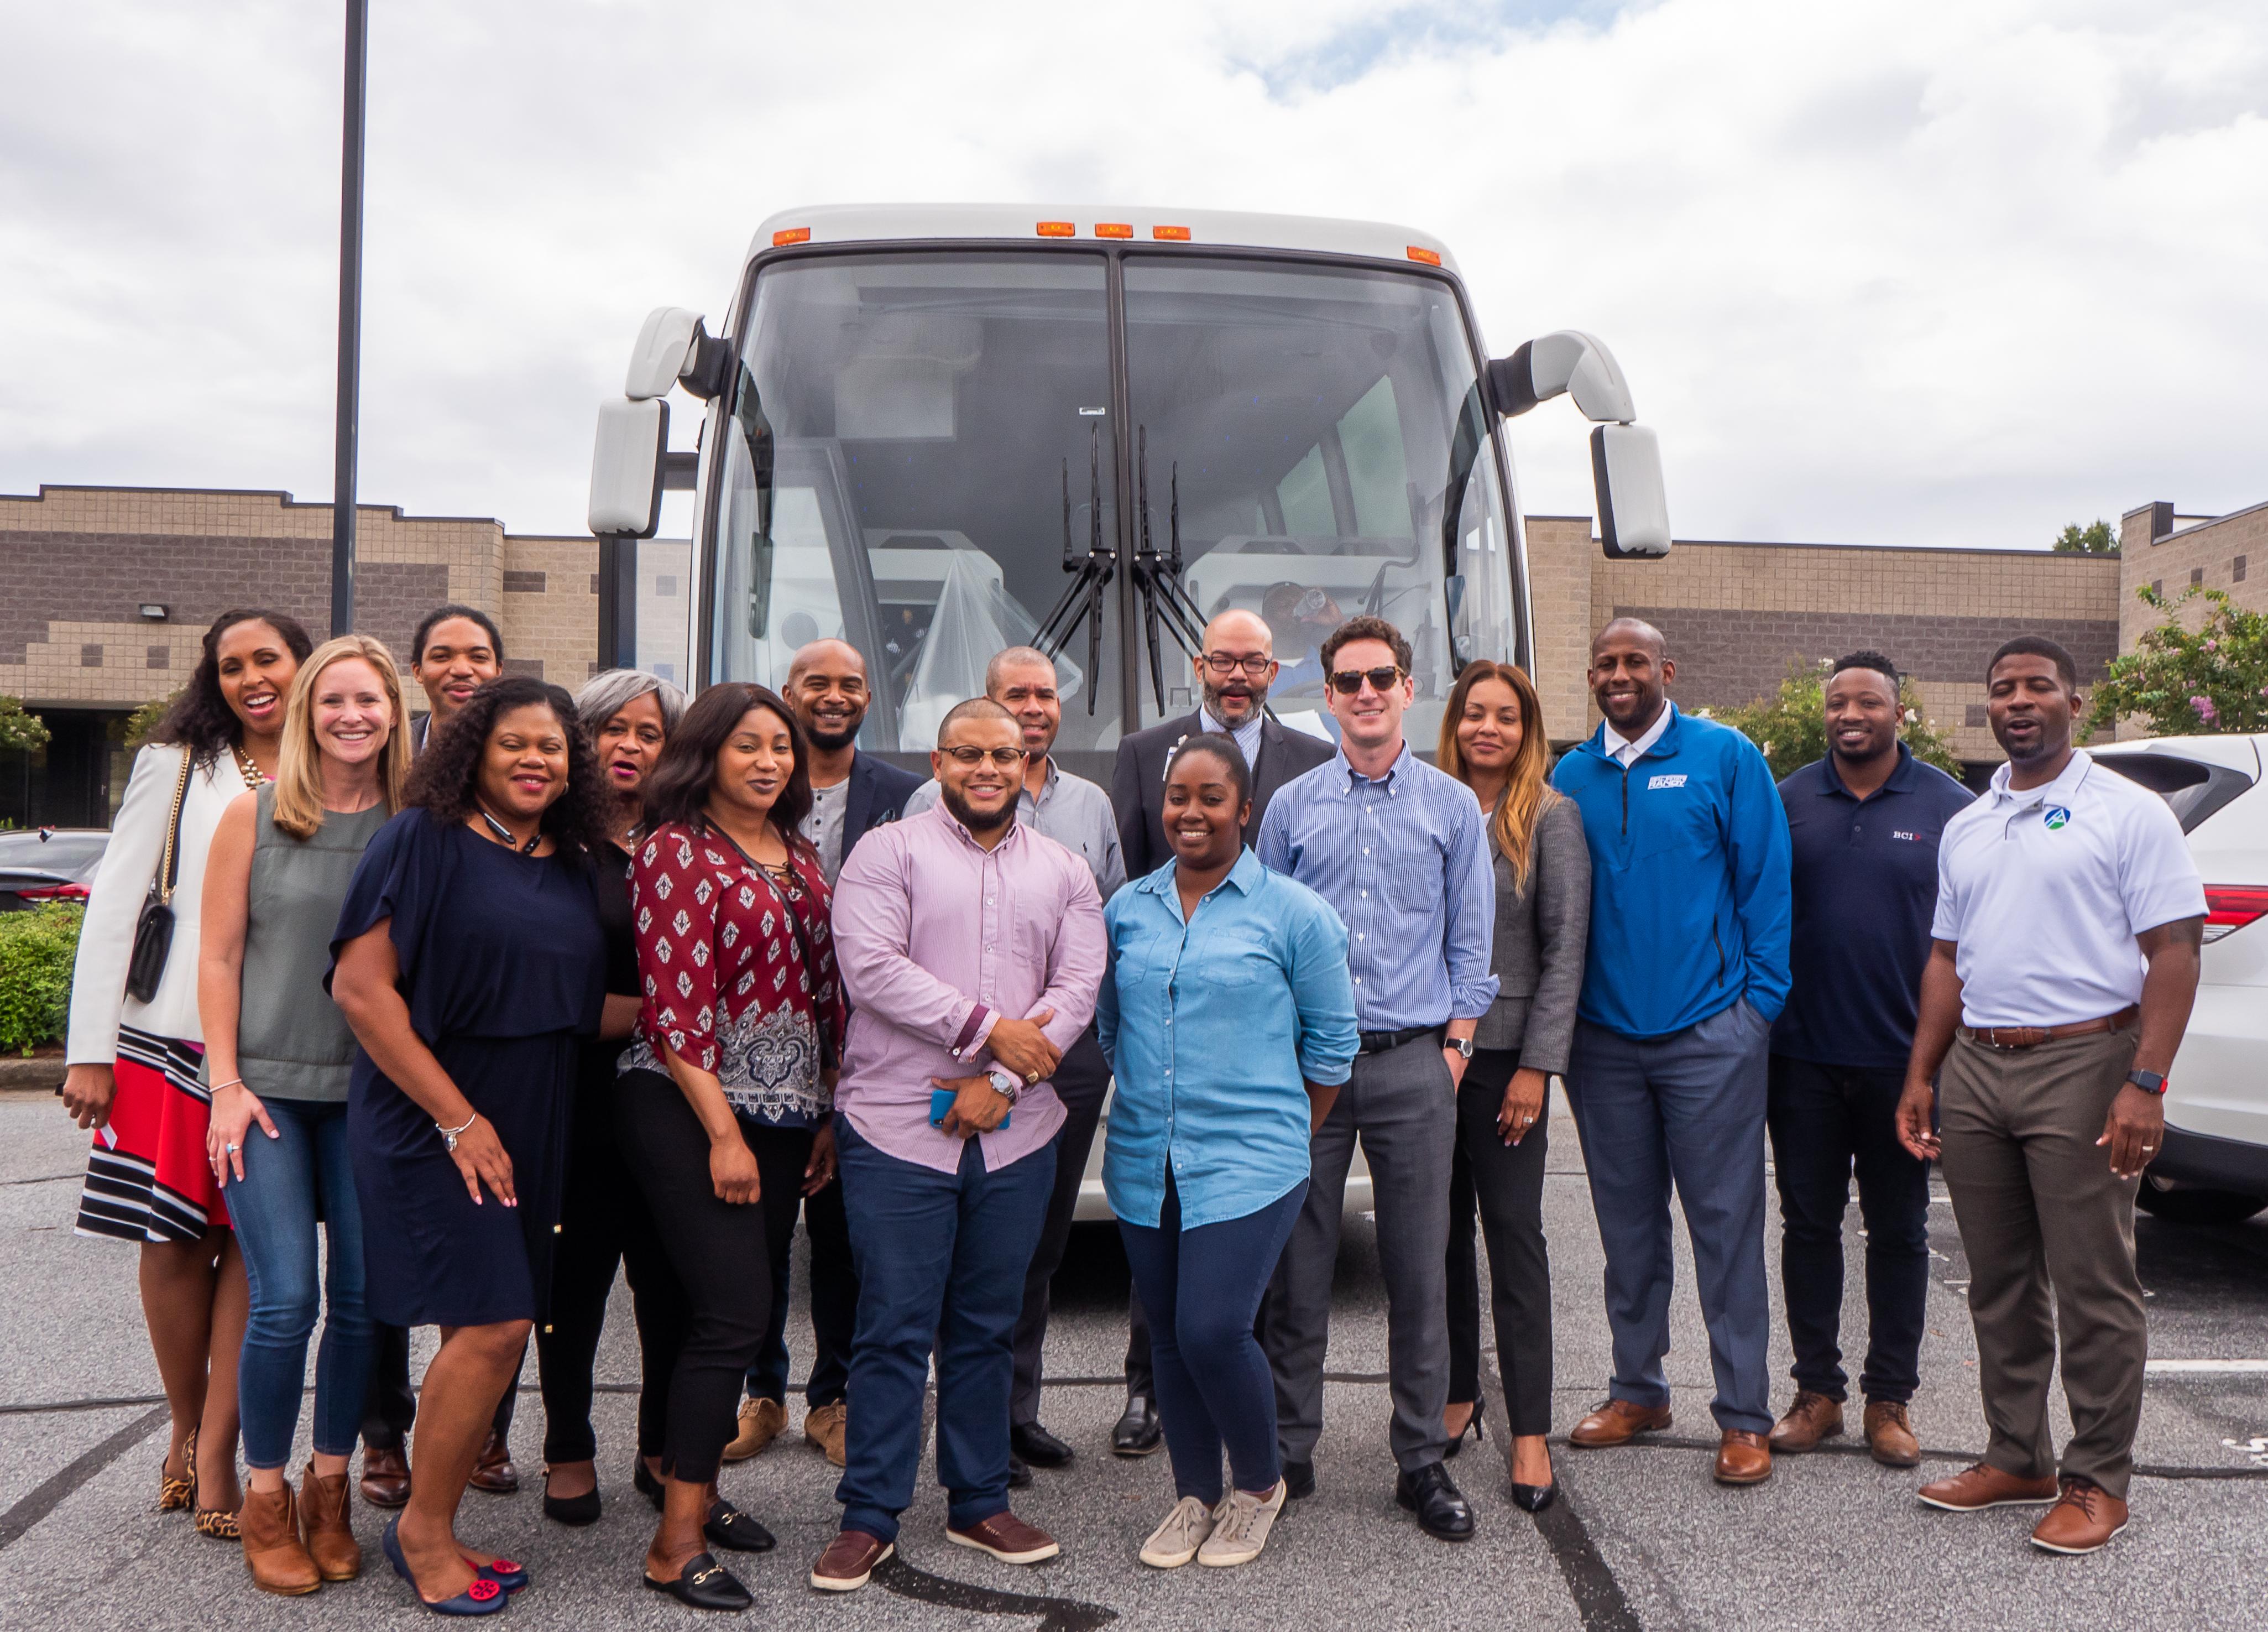 South Fulton County Bus Tour